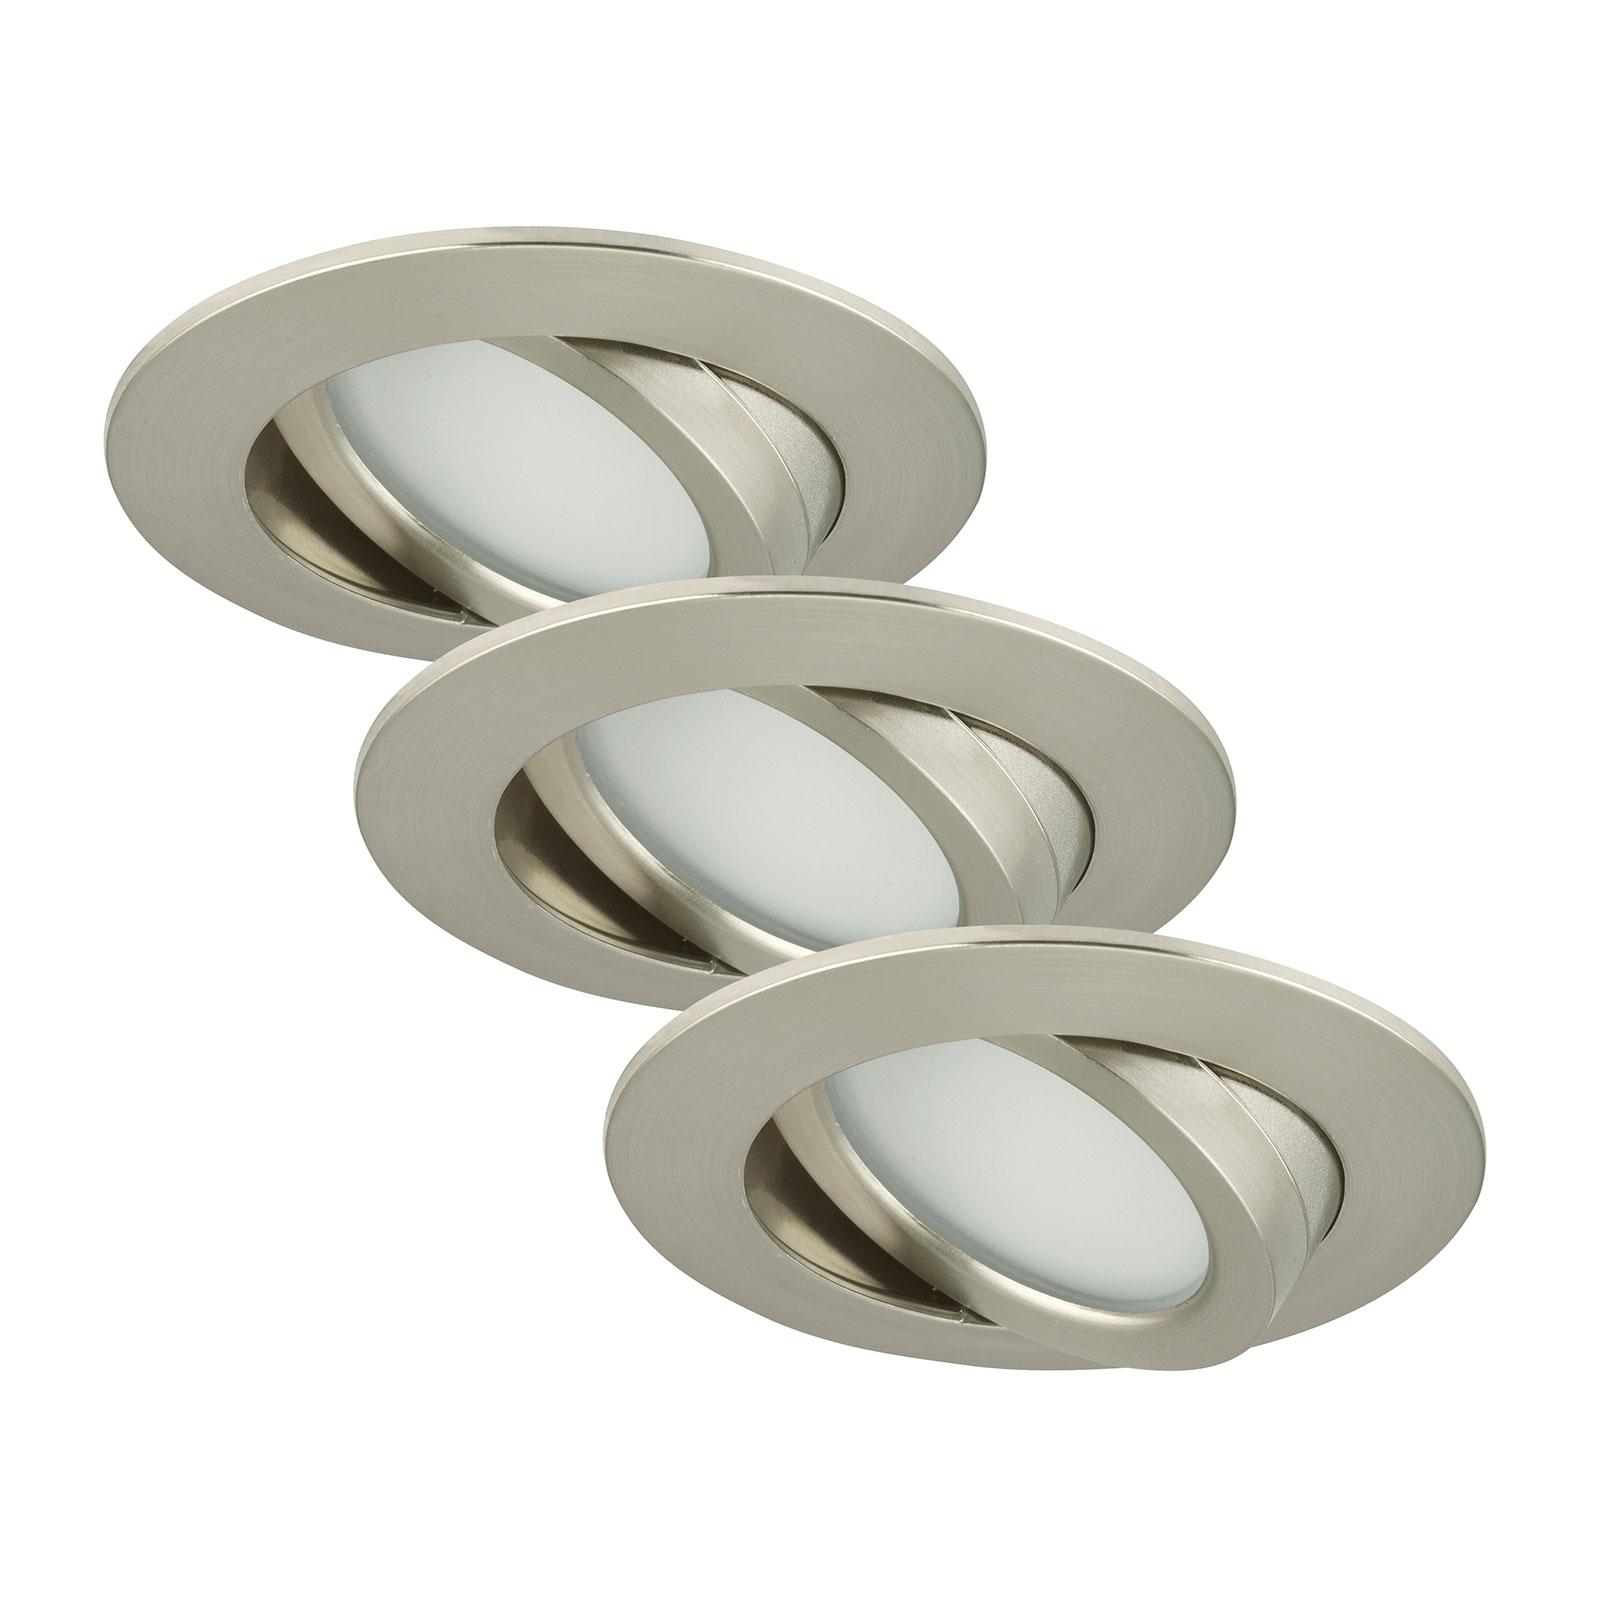 Bert drejelig LED-indbygningslampe 3 stk., nikkel